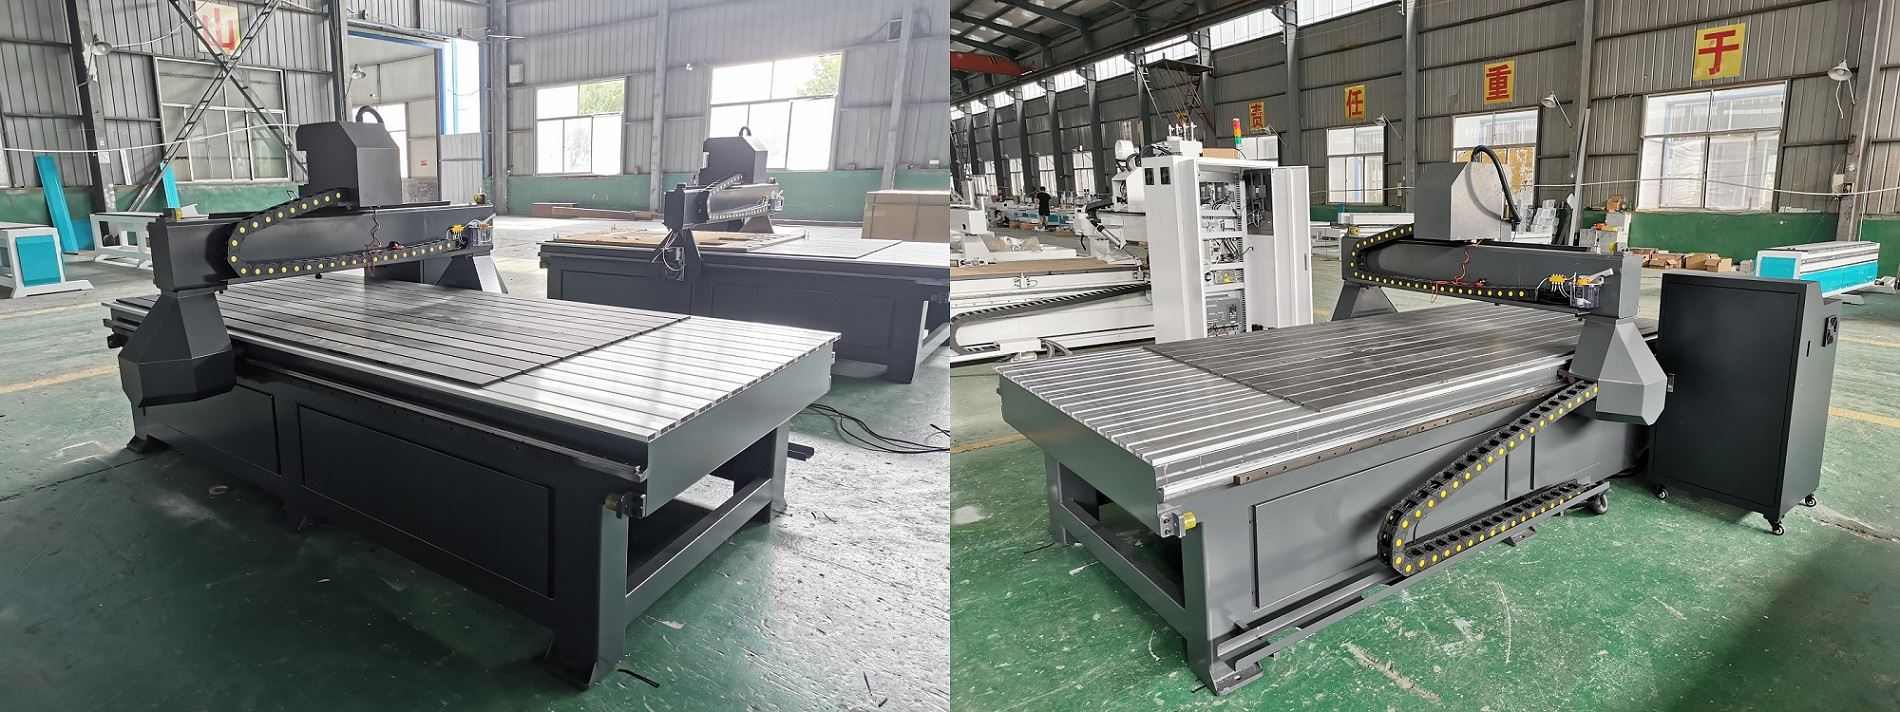 Wardrobe Making CNC MachineBedside Table CNC Machine